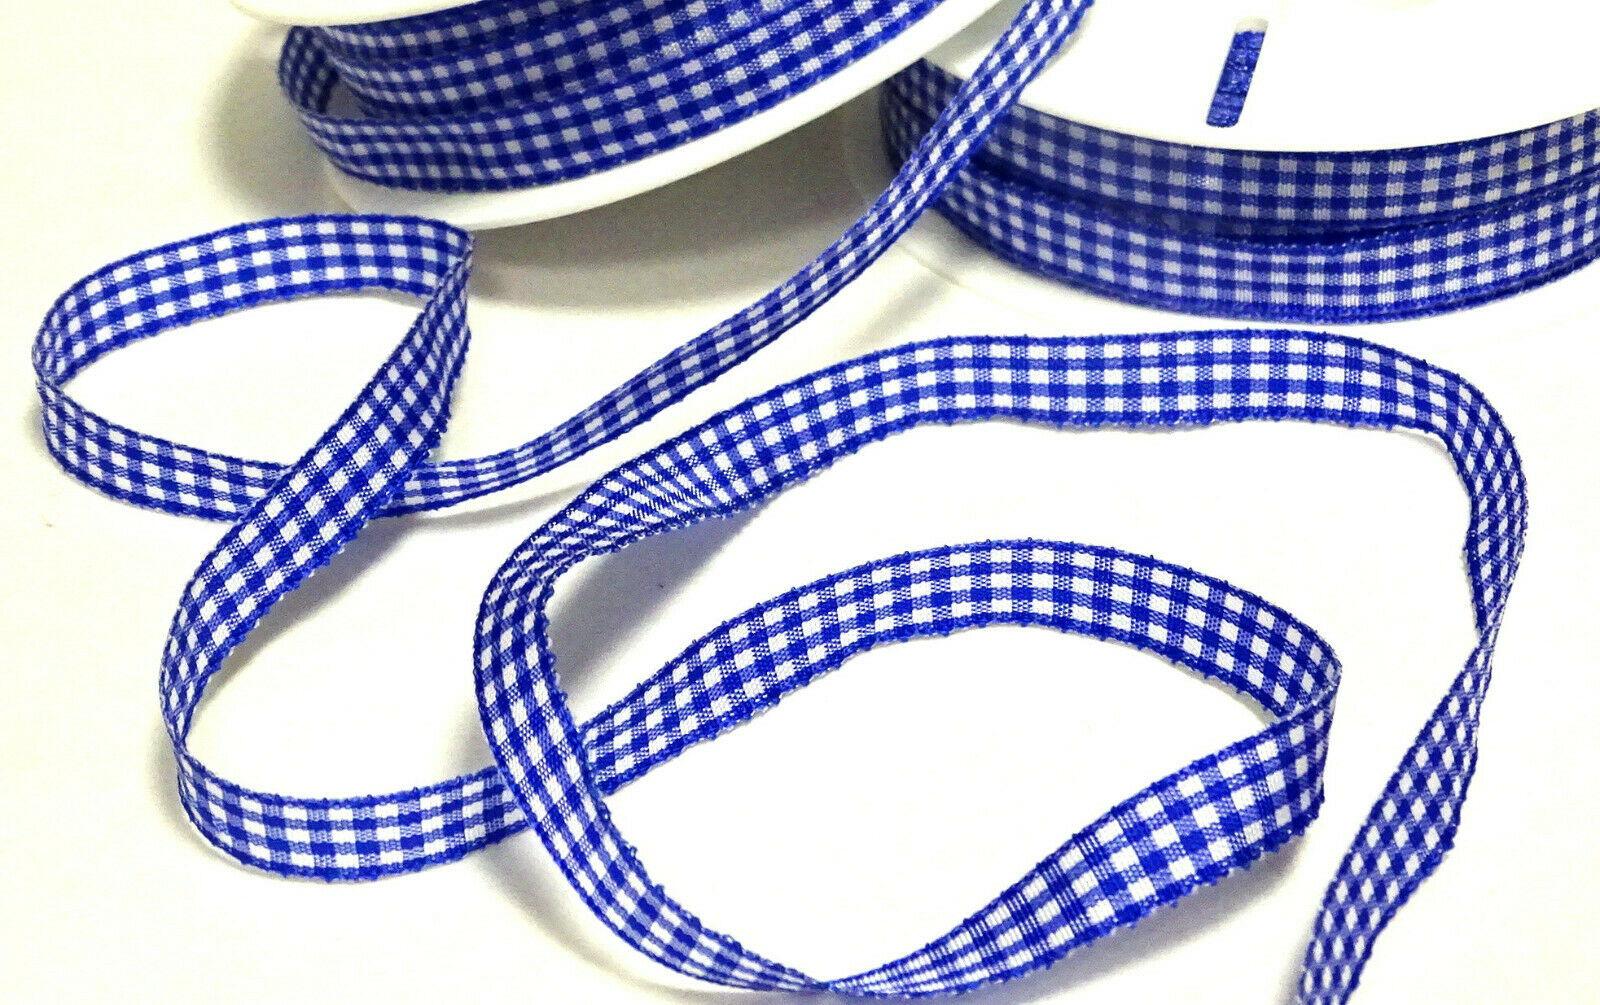 Karoband Schleifenband 50 m x 6mm / 10mm Vichy Dekoband ab 0,18€/m Blau kariert - 10 mm x 50 m